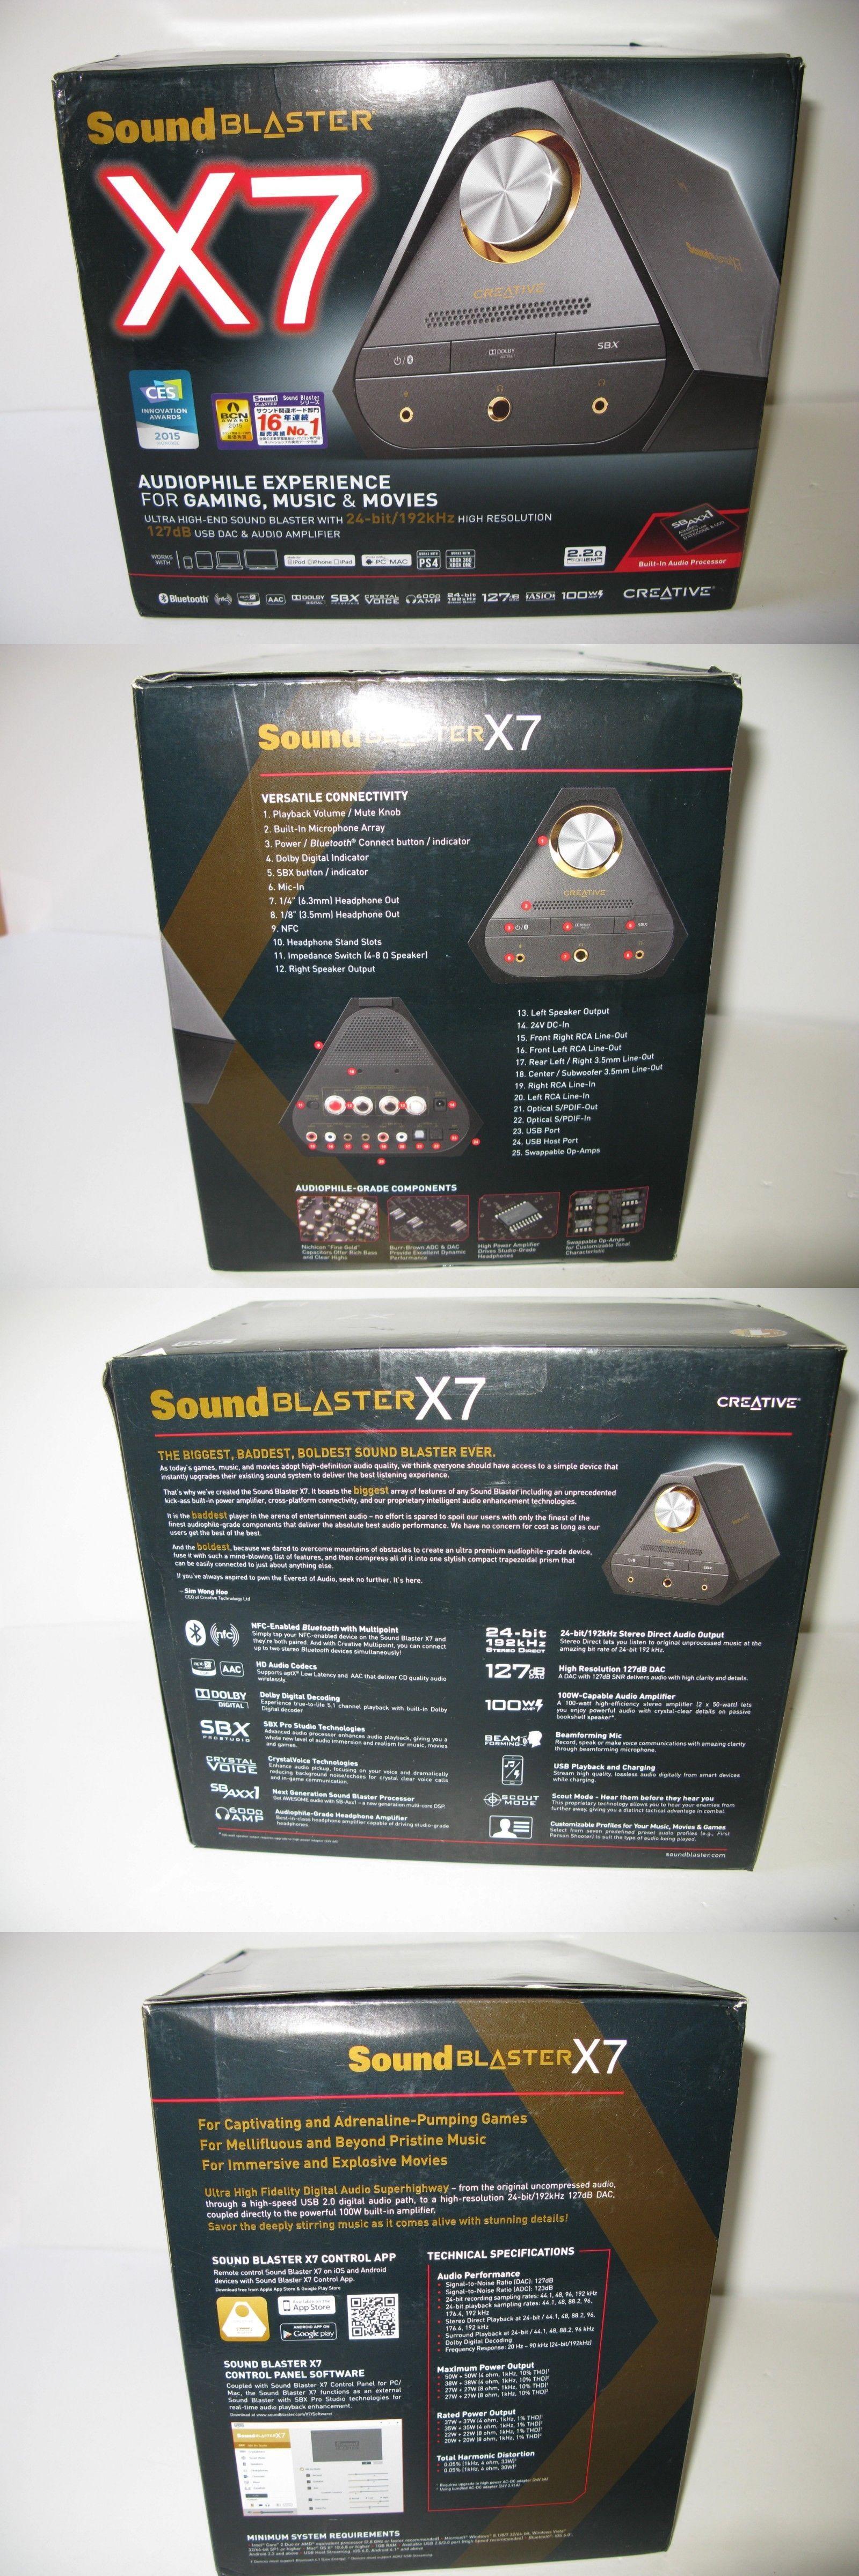 Sound Cards External 75518: Creative Sound Blaster X7 Powerful Audio